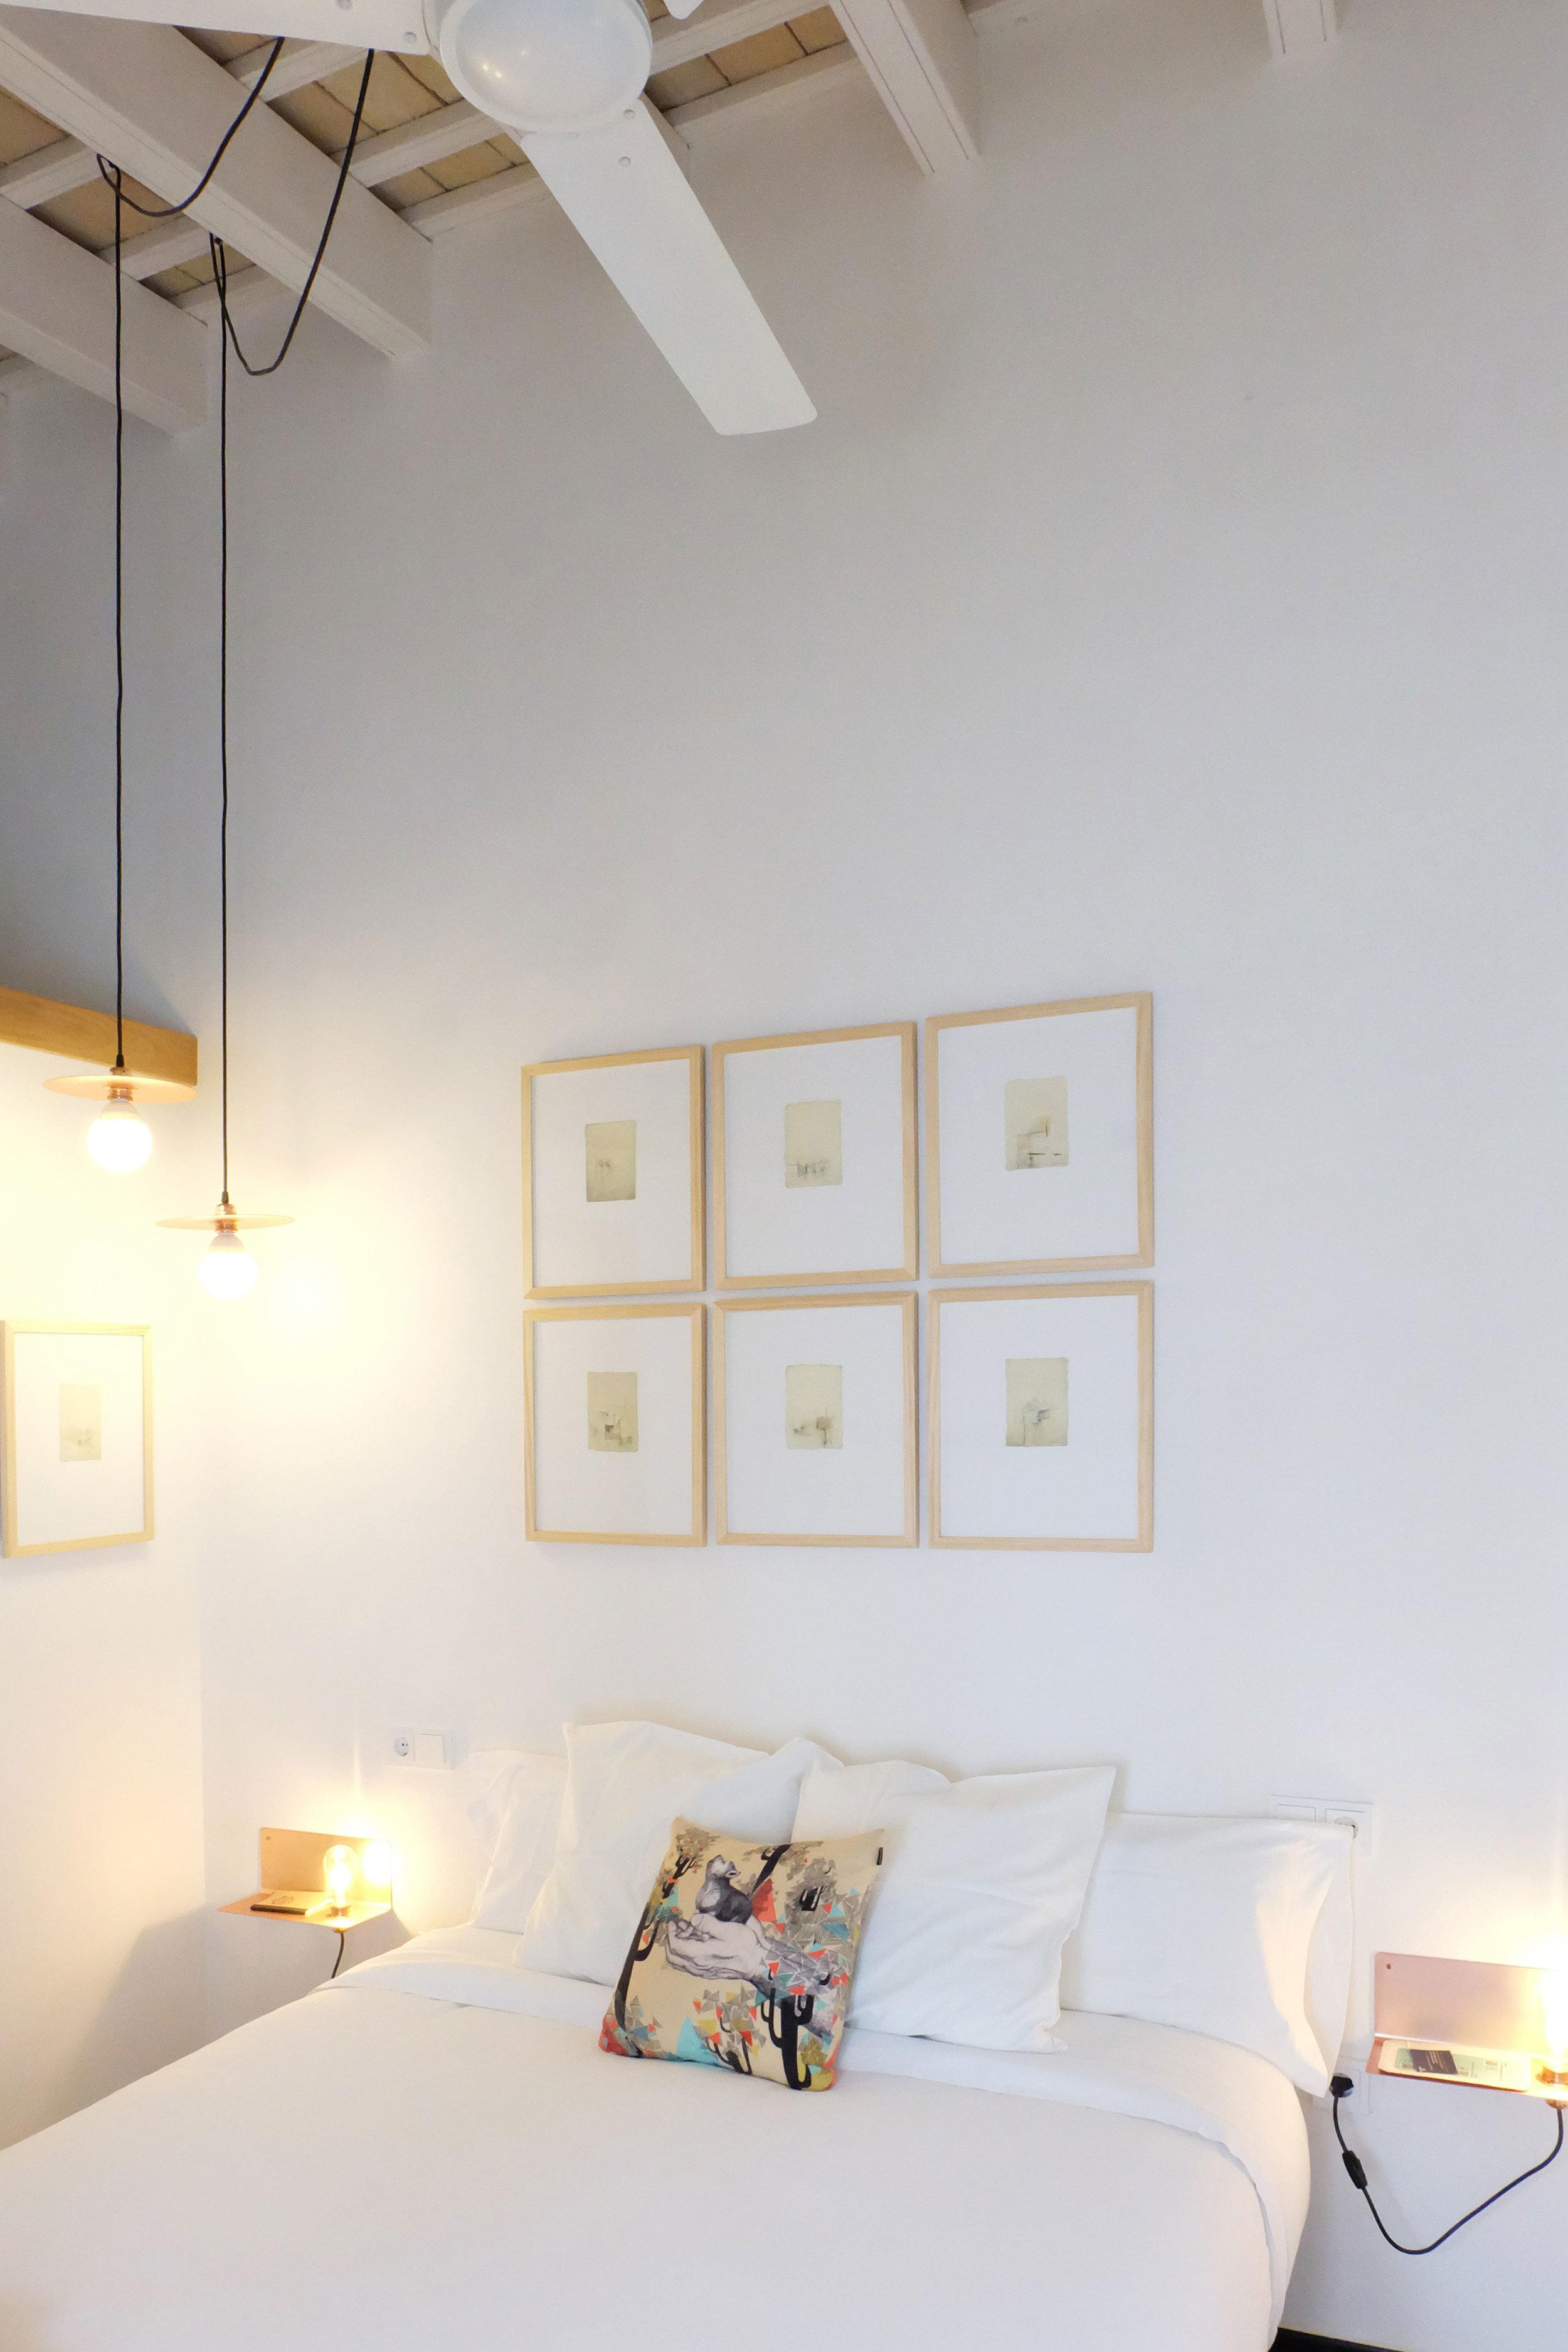 Hotel-Casa-de-Huespedes-Santa-Maria-Habitacion-10-18.jpg